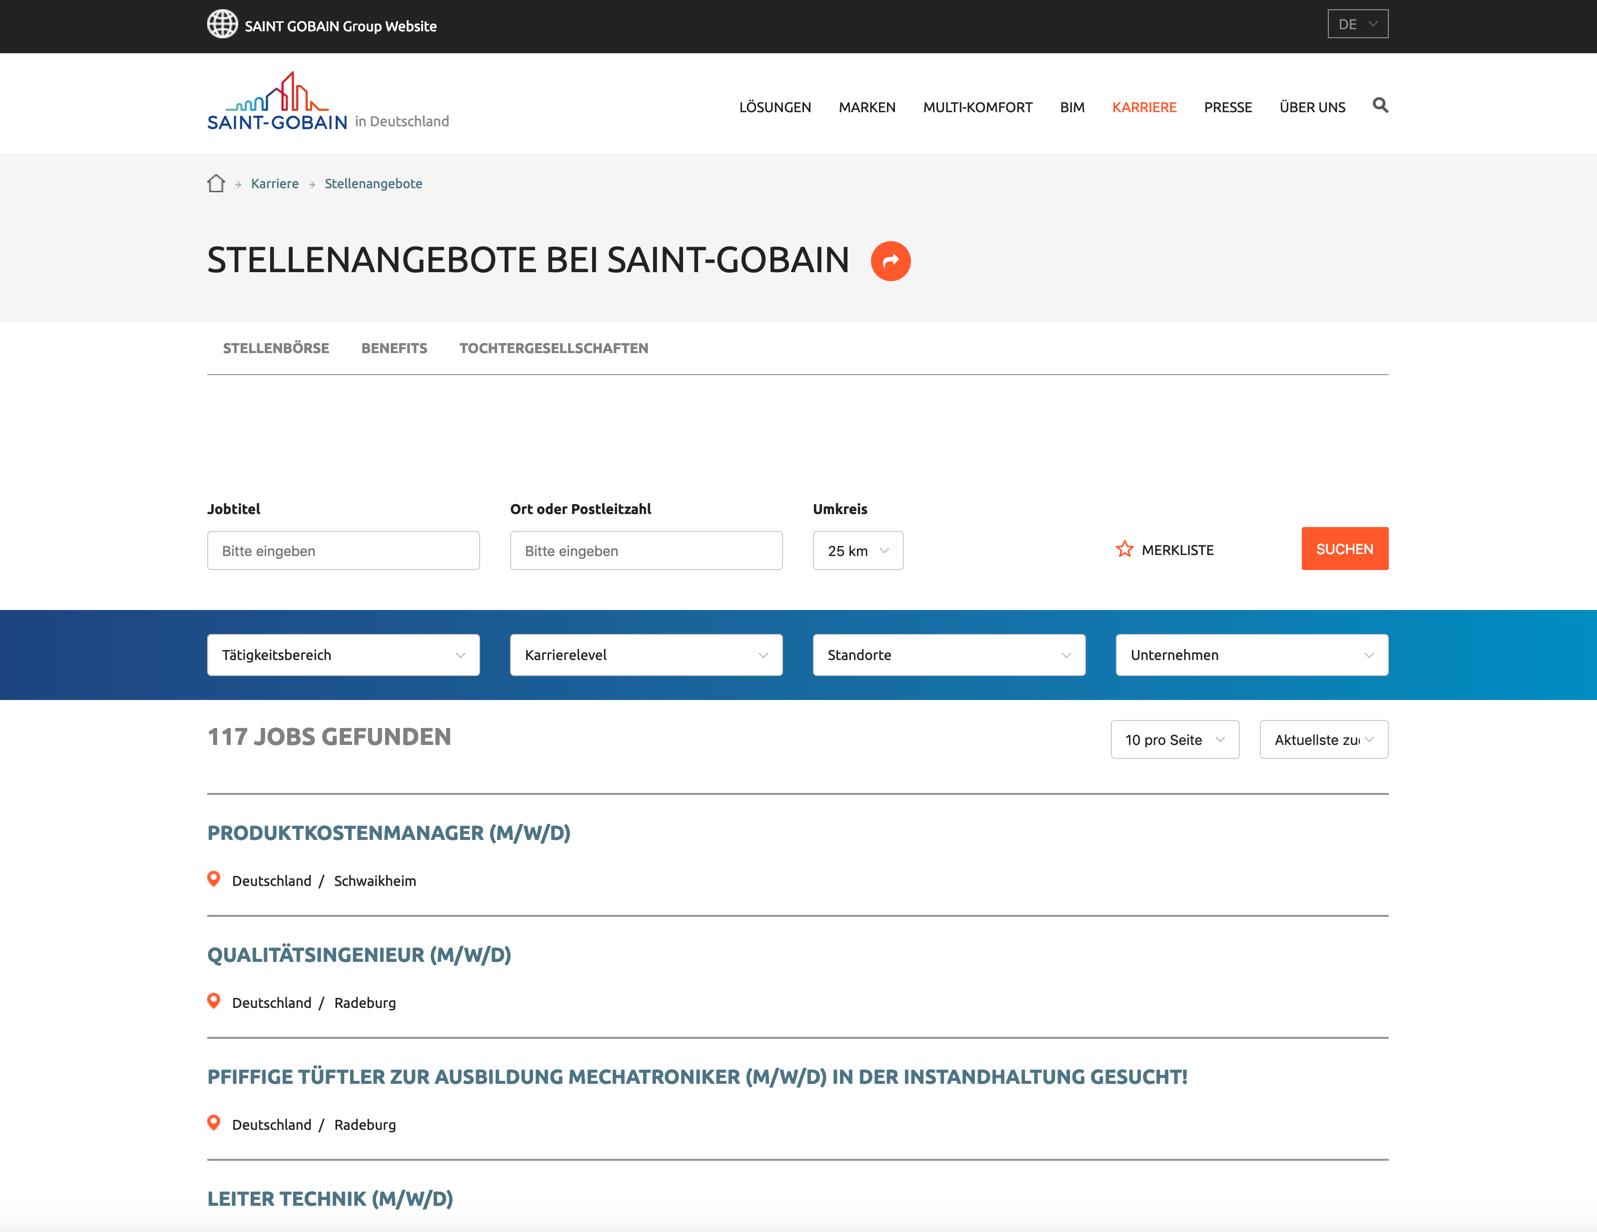 saint-gobain.png